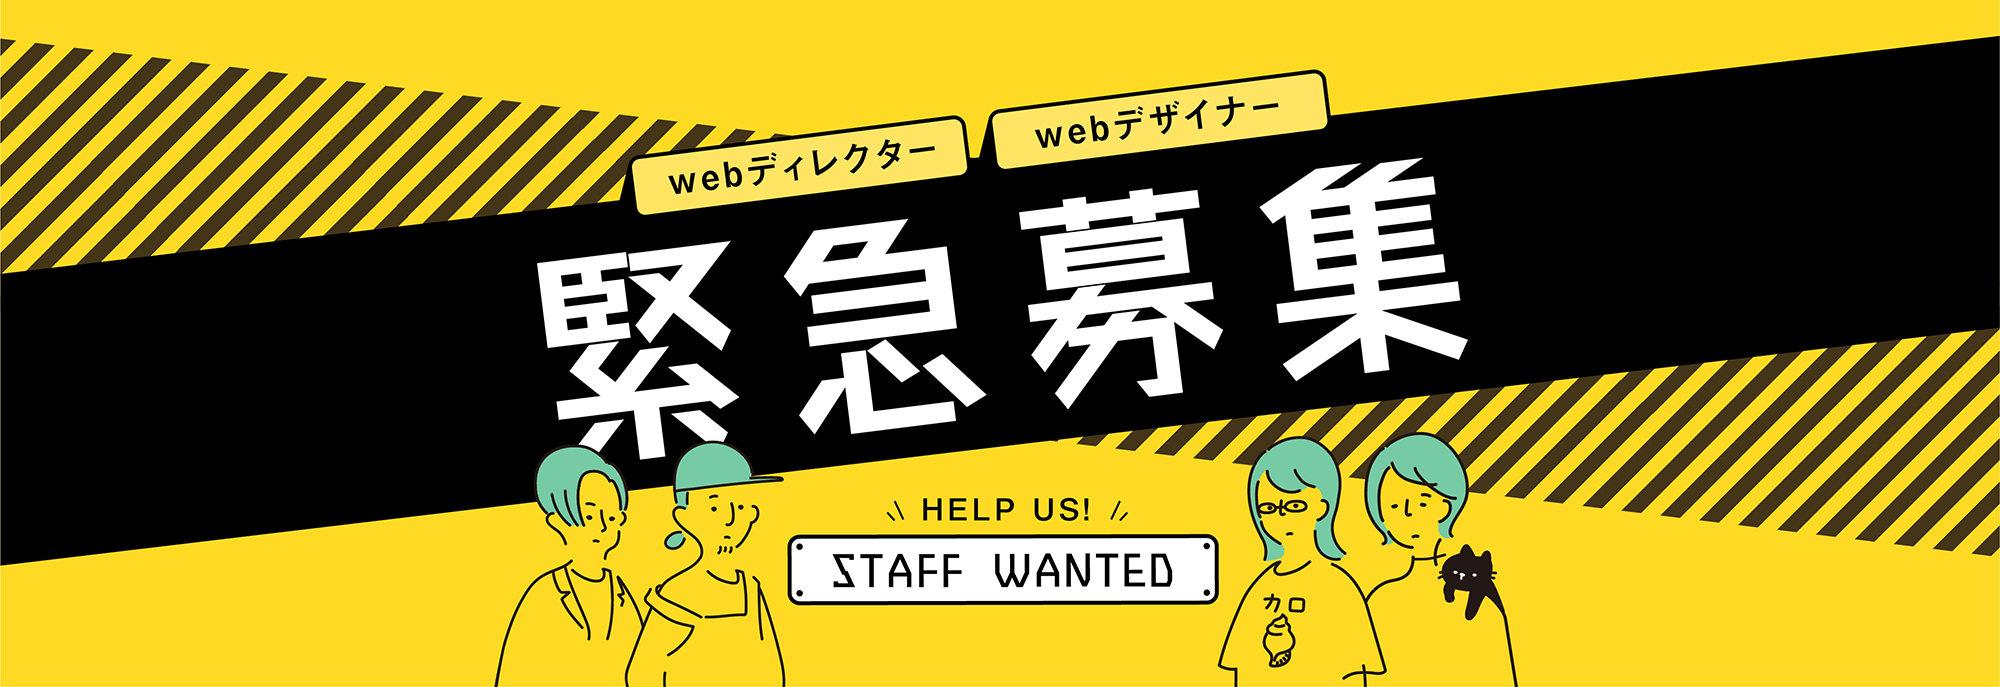 webrecruit_top.jpg